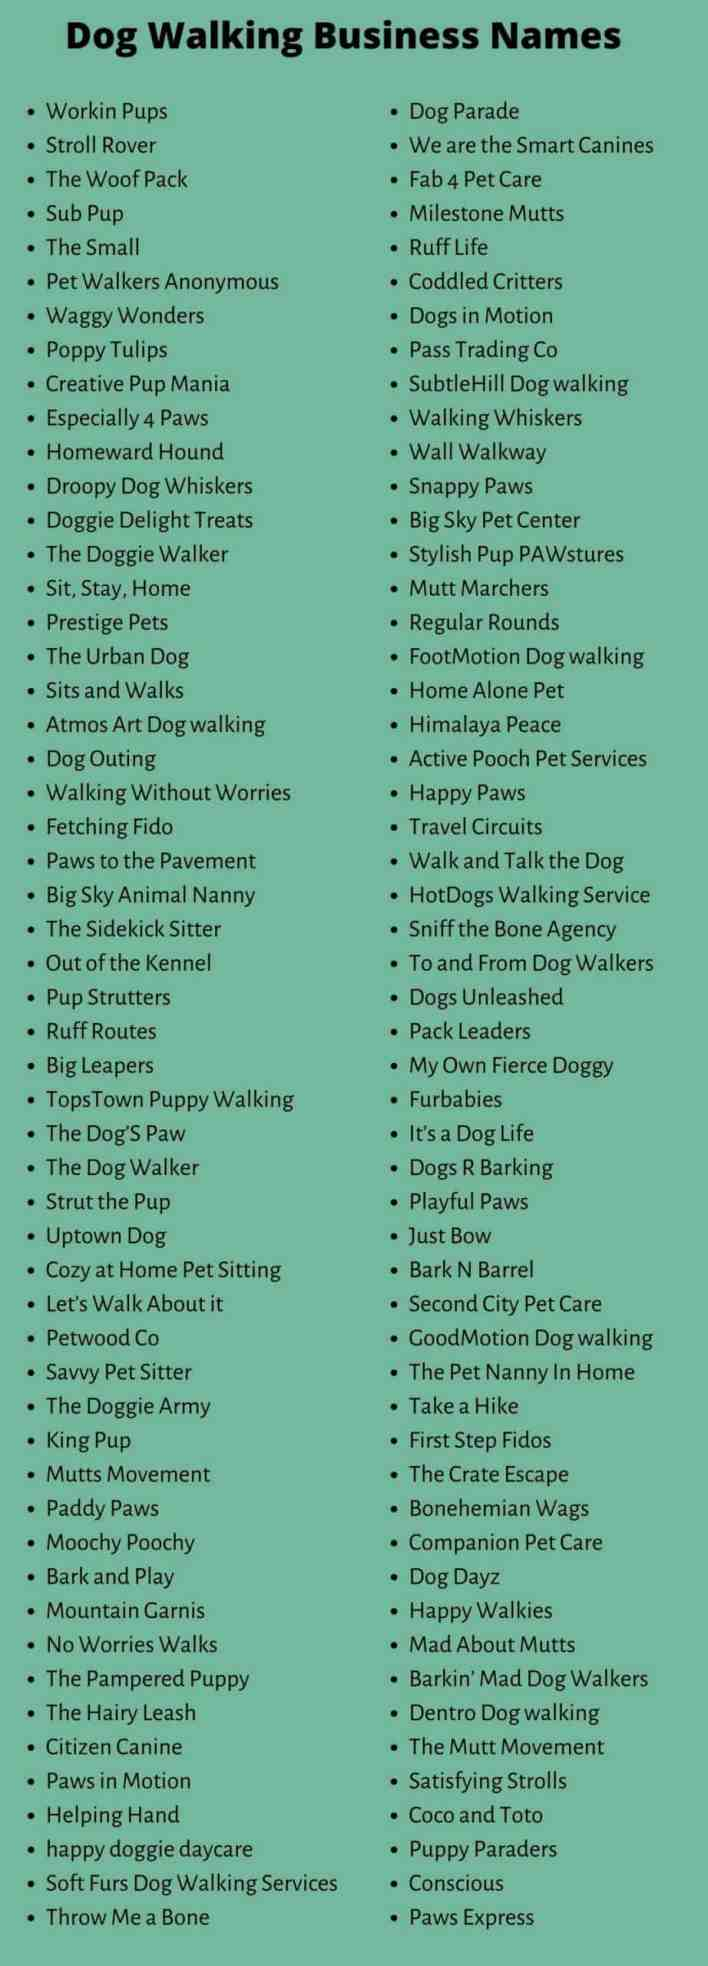 Dog Business Names